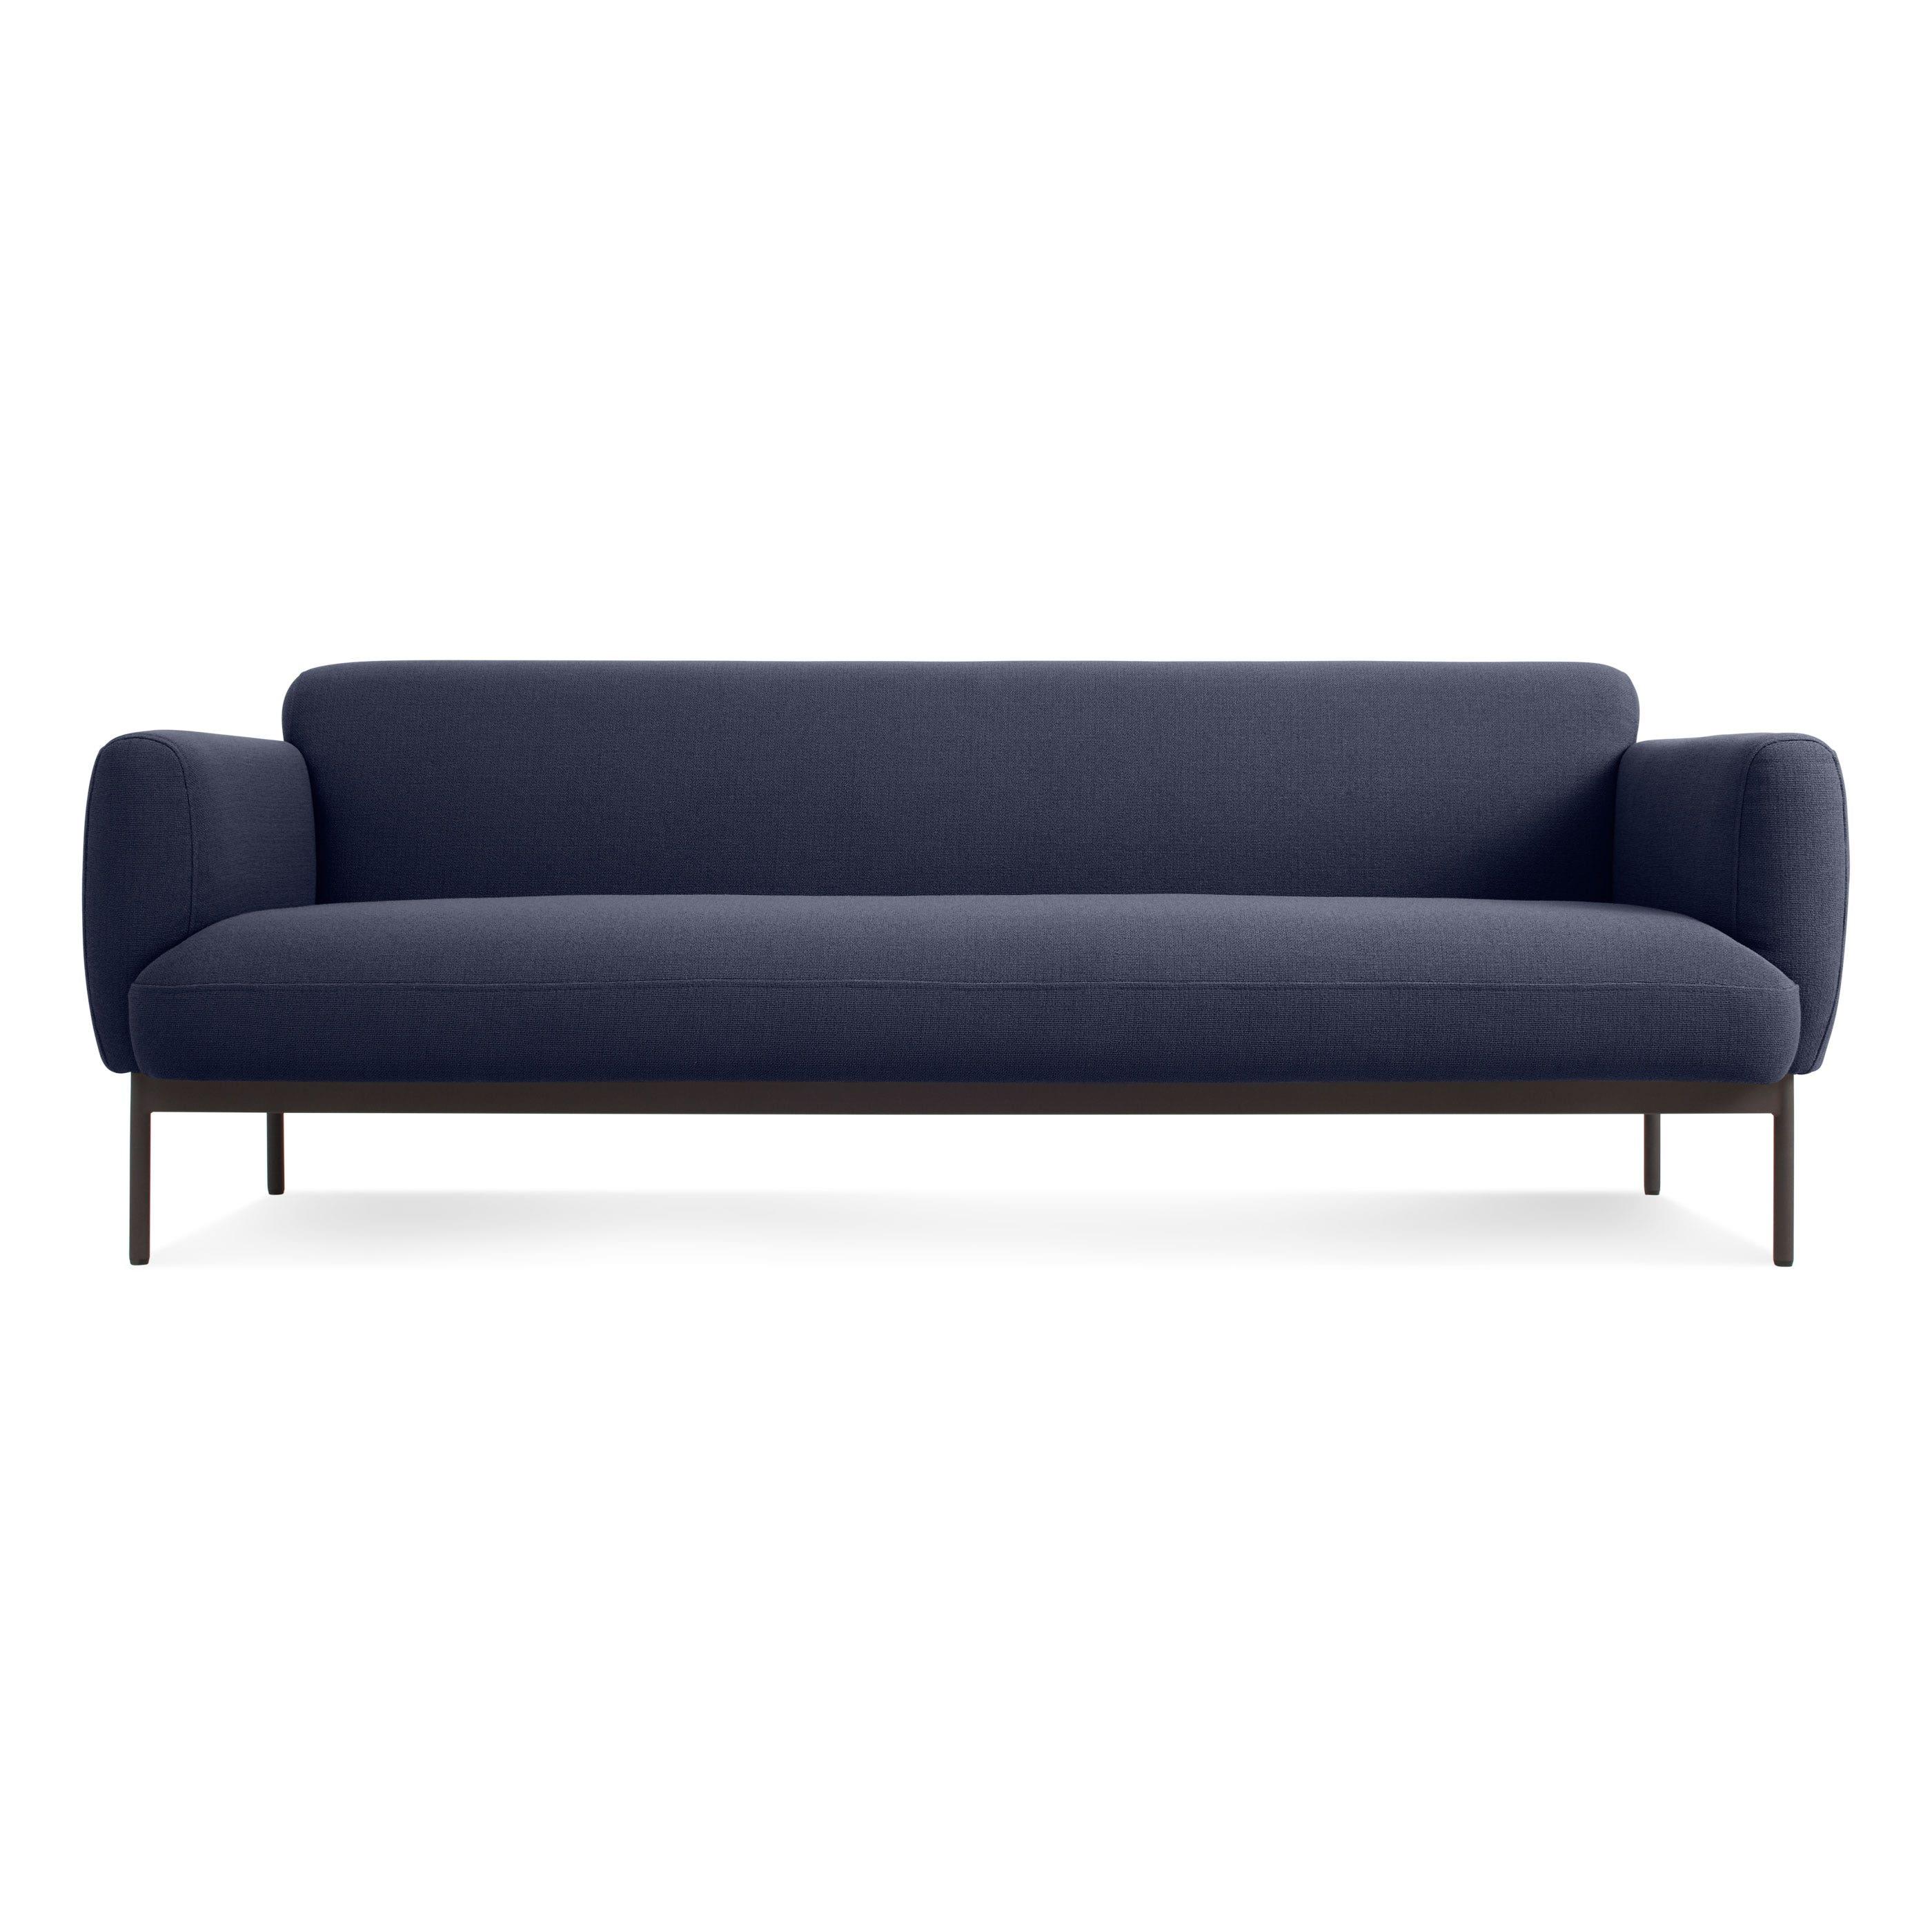 Puff Puff Sofa Contemporary Uphosltered Sofa Blu Dot - Puff sofa 2